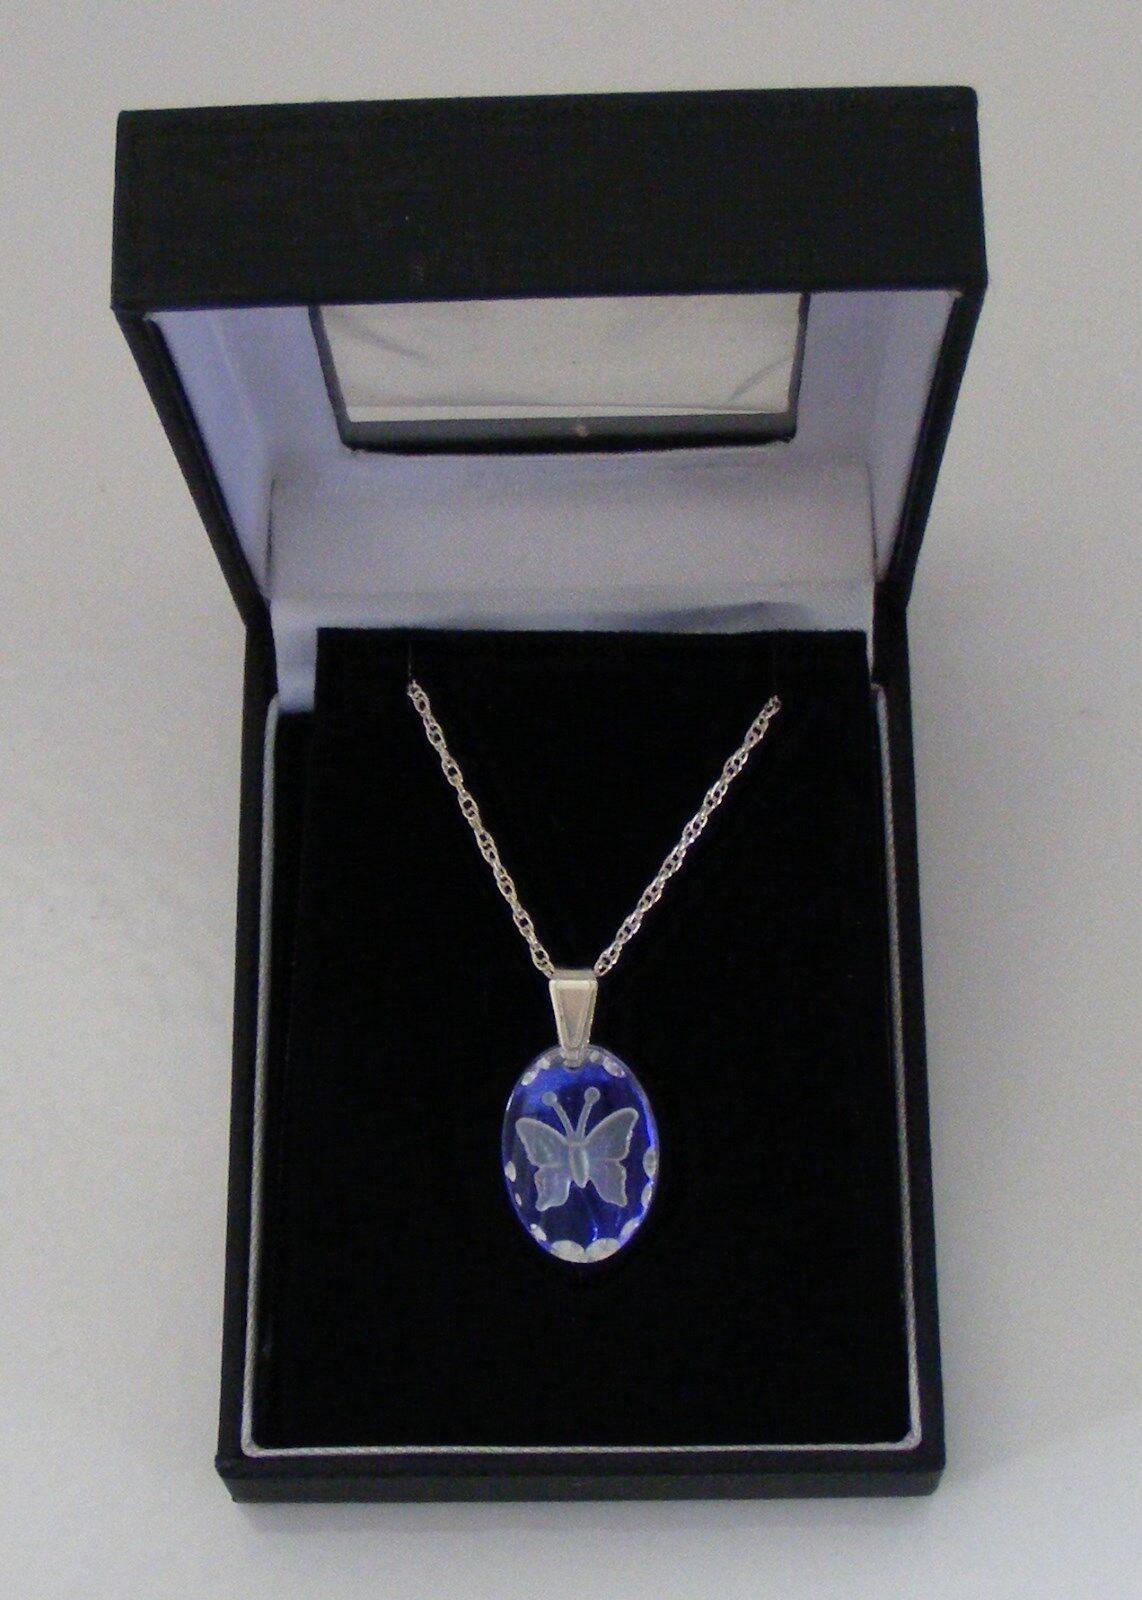 Glace blue petit ovale papillon cristal pendentif